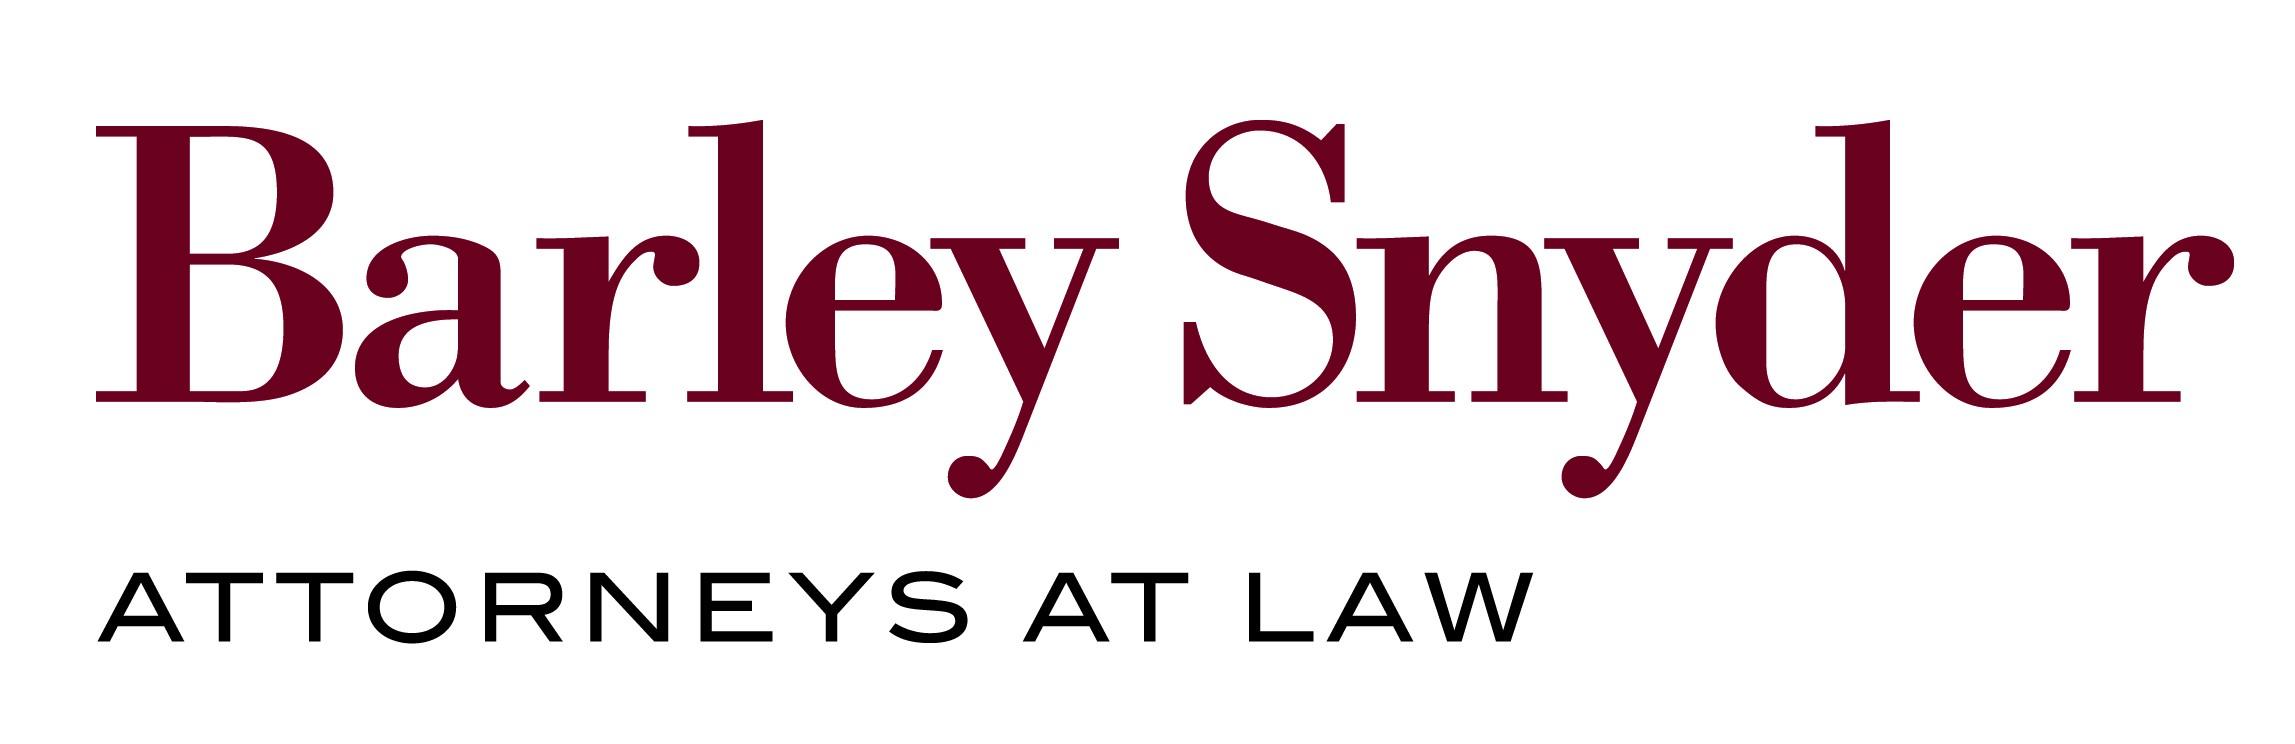 Barley Snyder Attorneys at Law Sponsor Logo